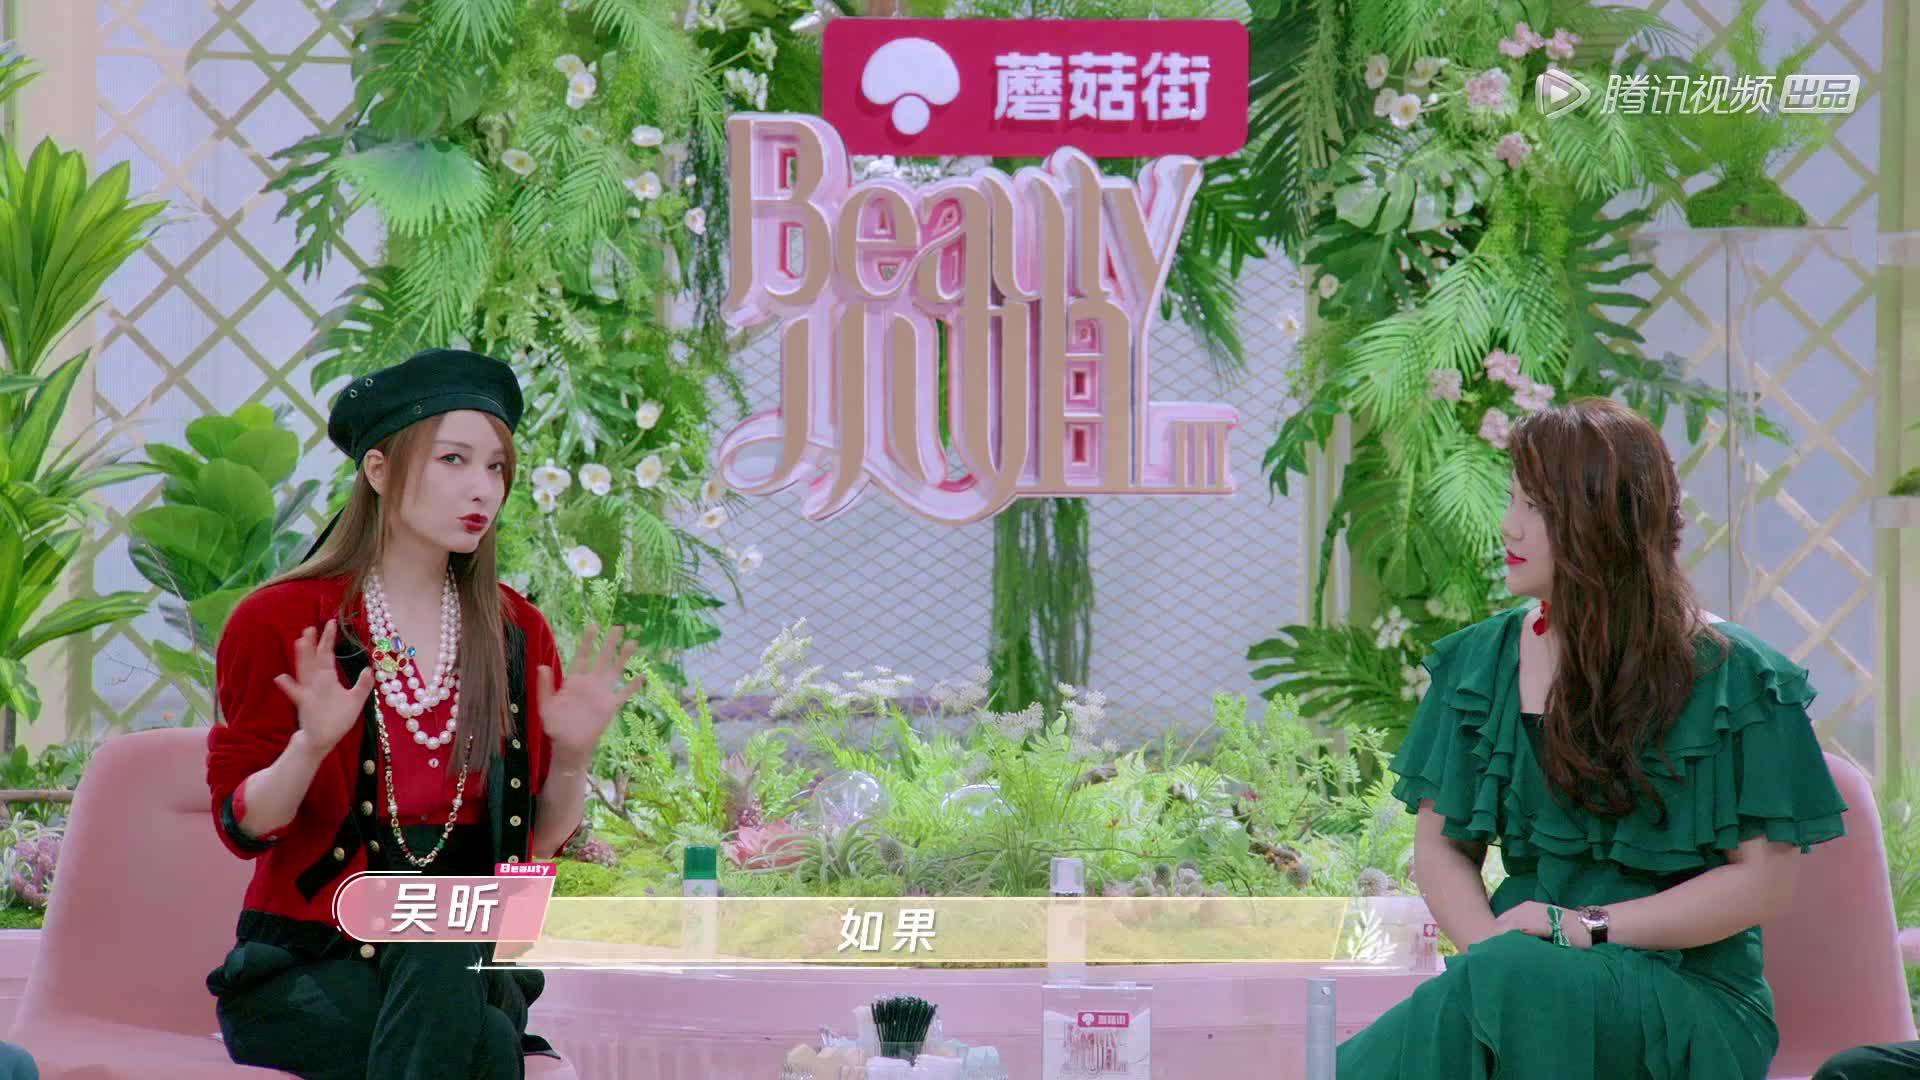 Beauty小姐 吴昕想让杨天真帮忙得奥斯卡?